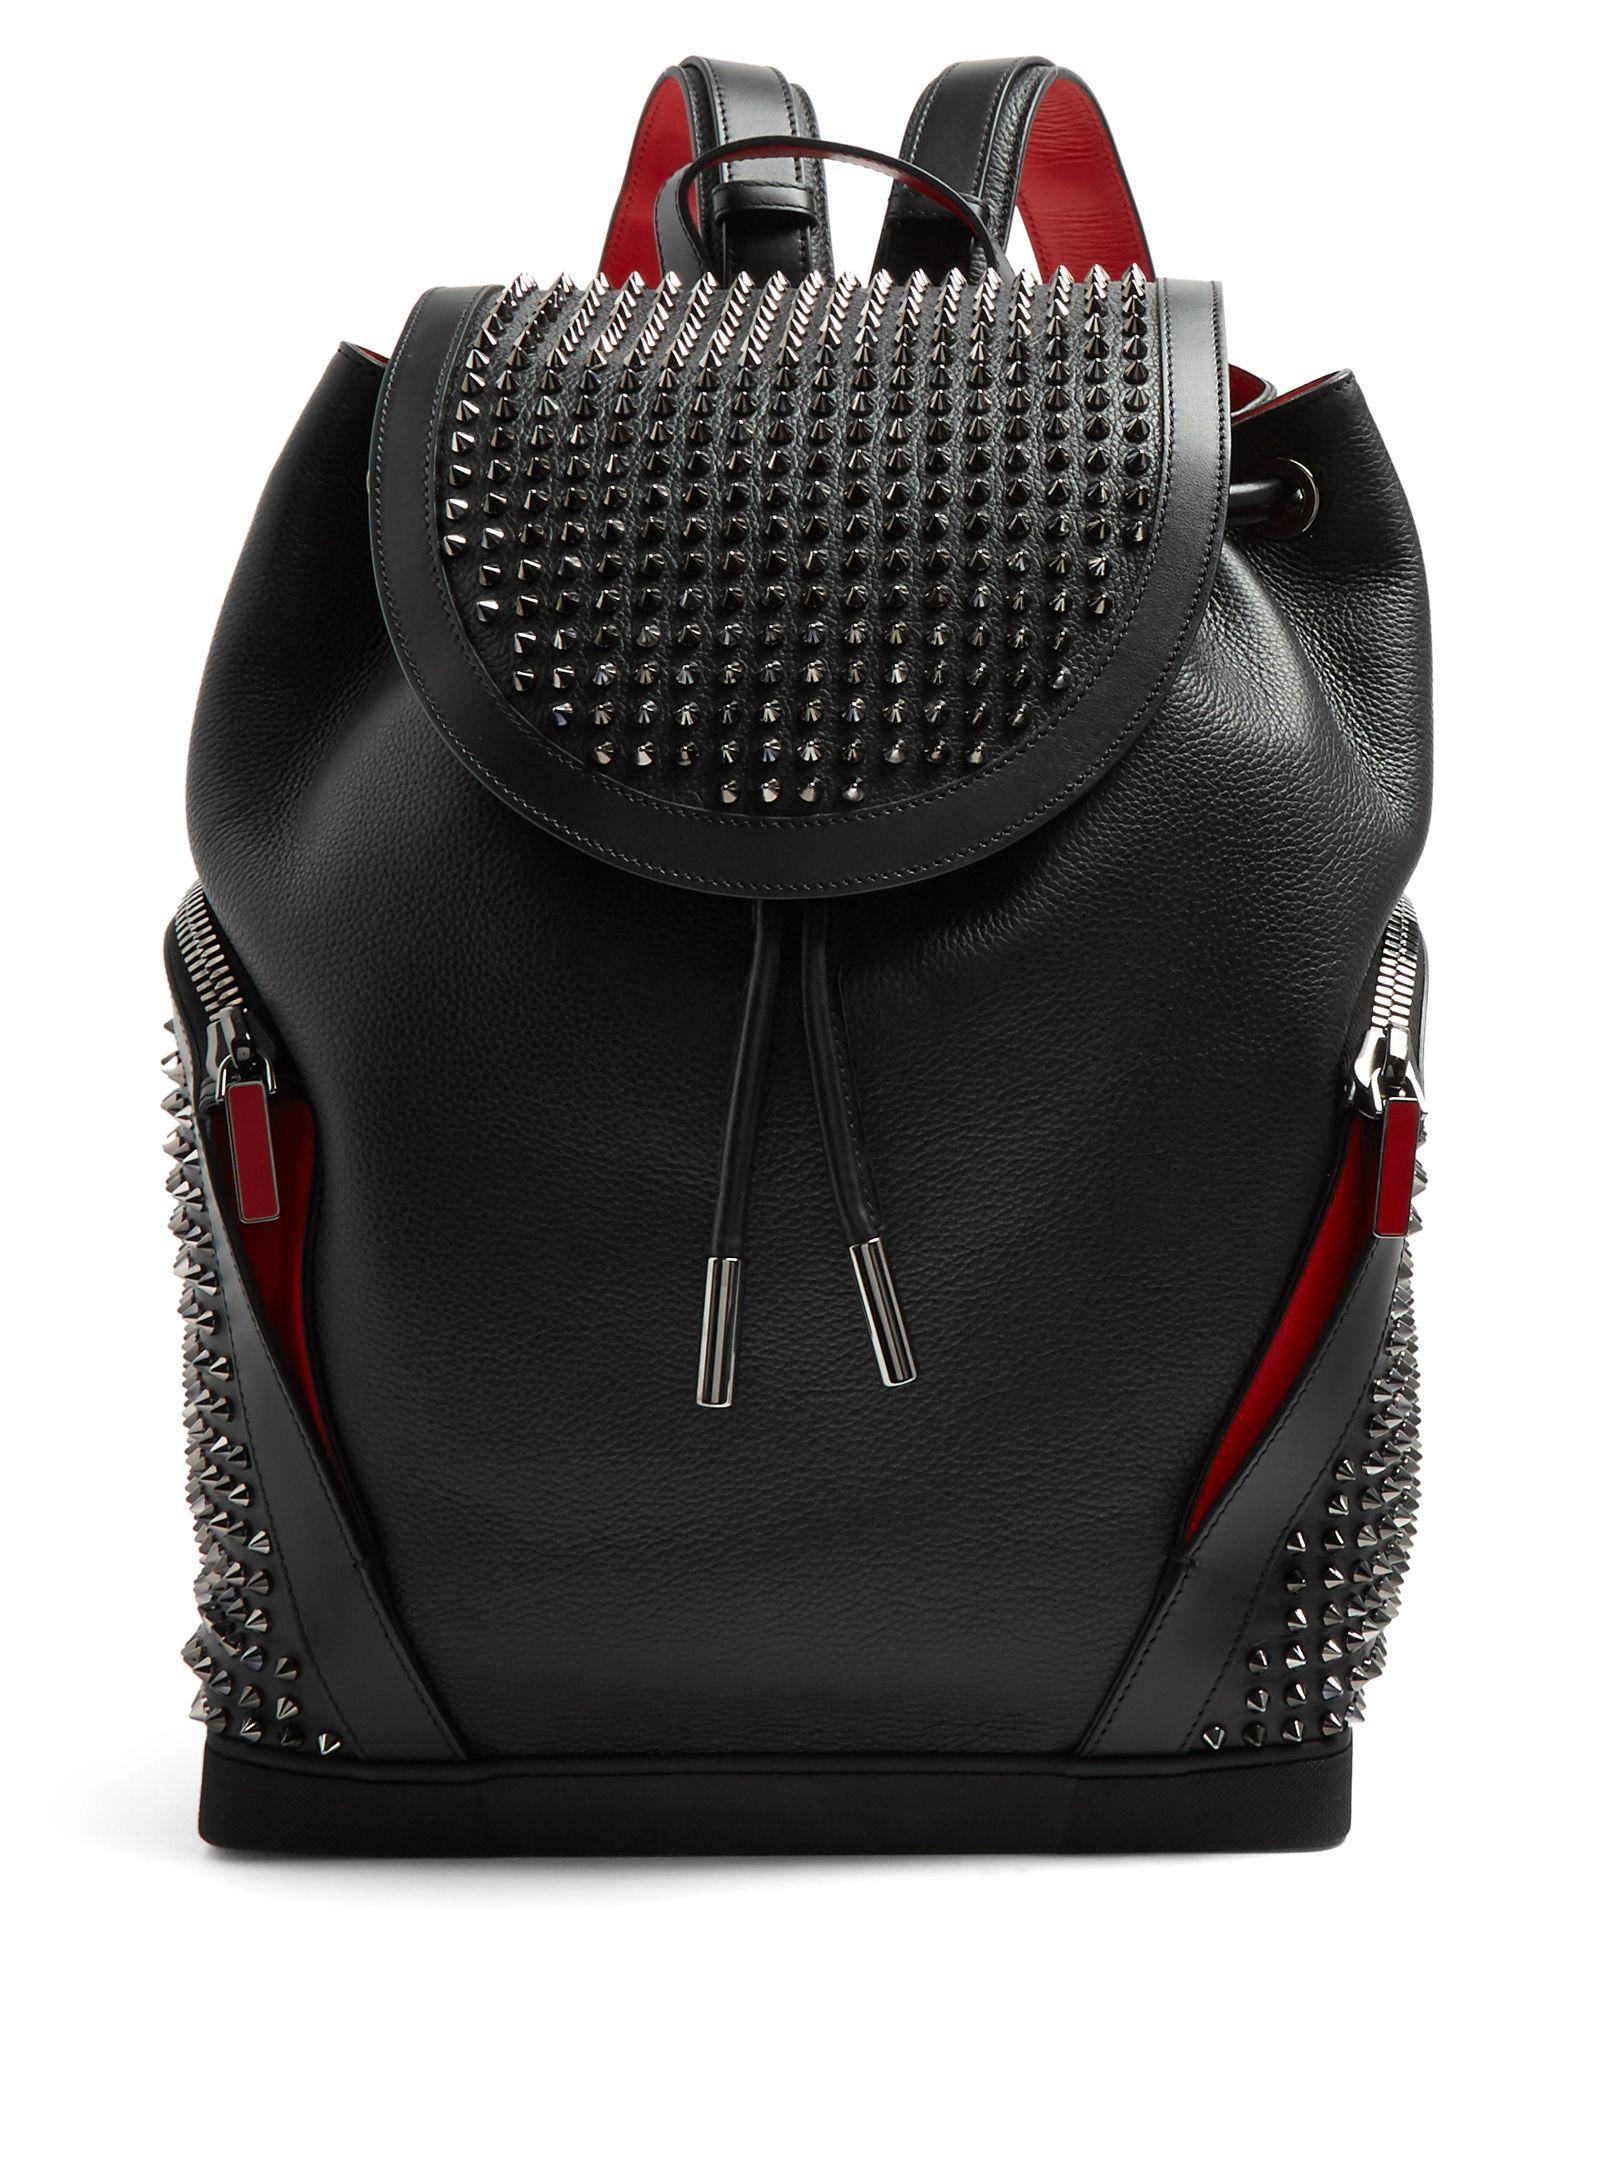 441b59cb7f5 Explorafunk leather spike-embellished backpack | Christian Louboutin ...